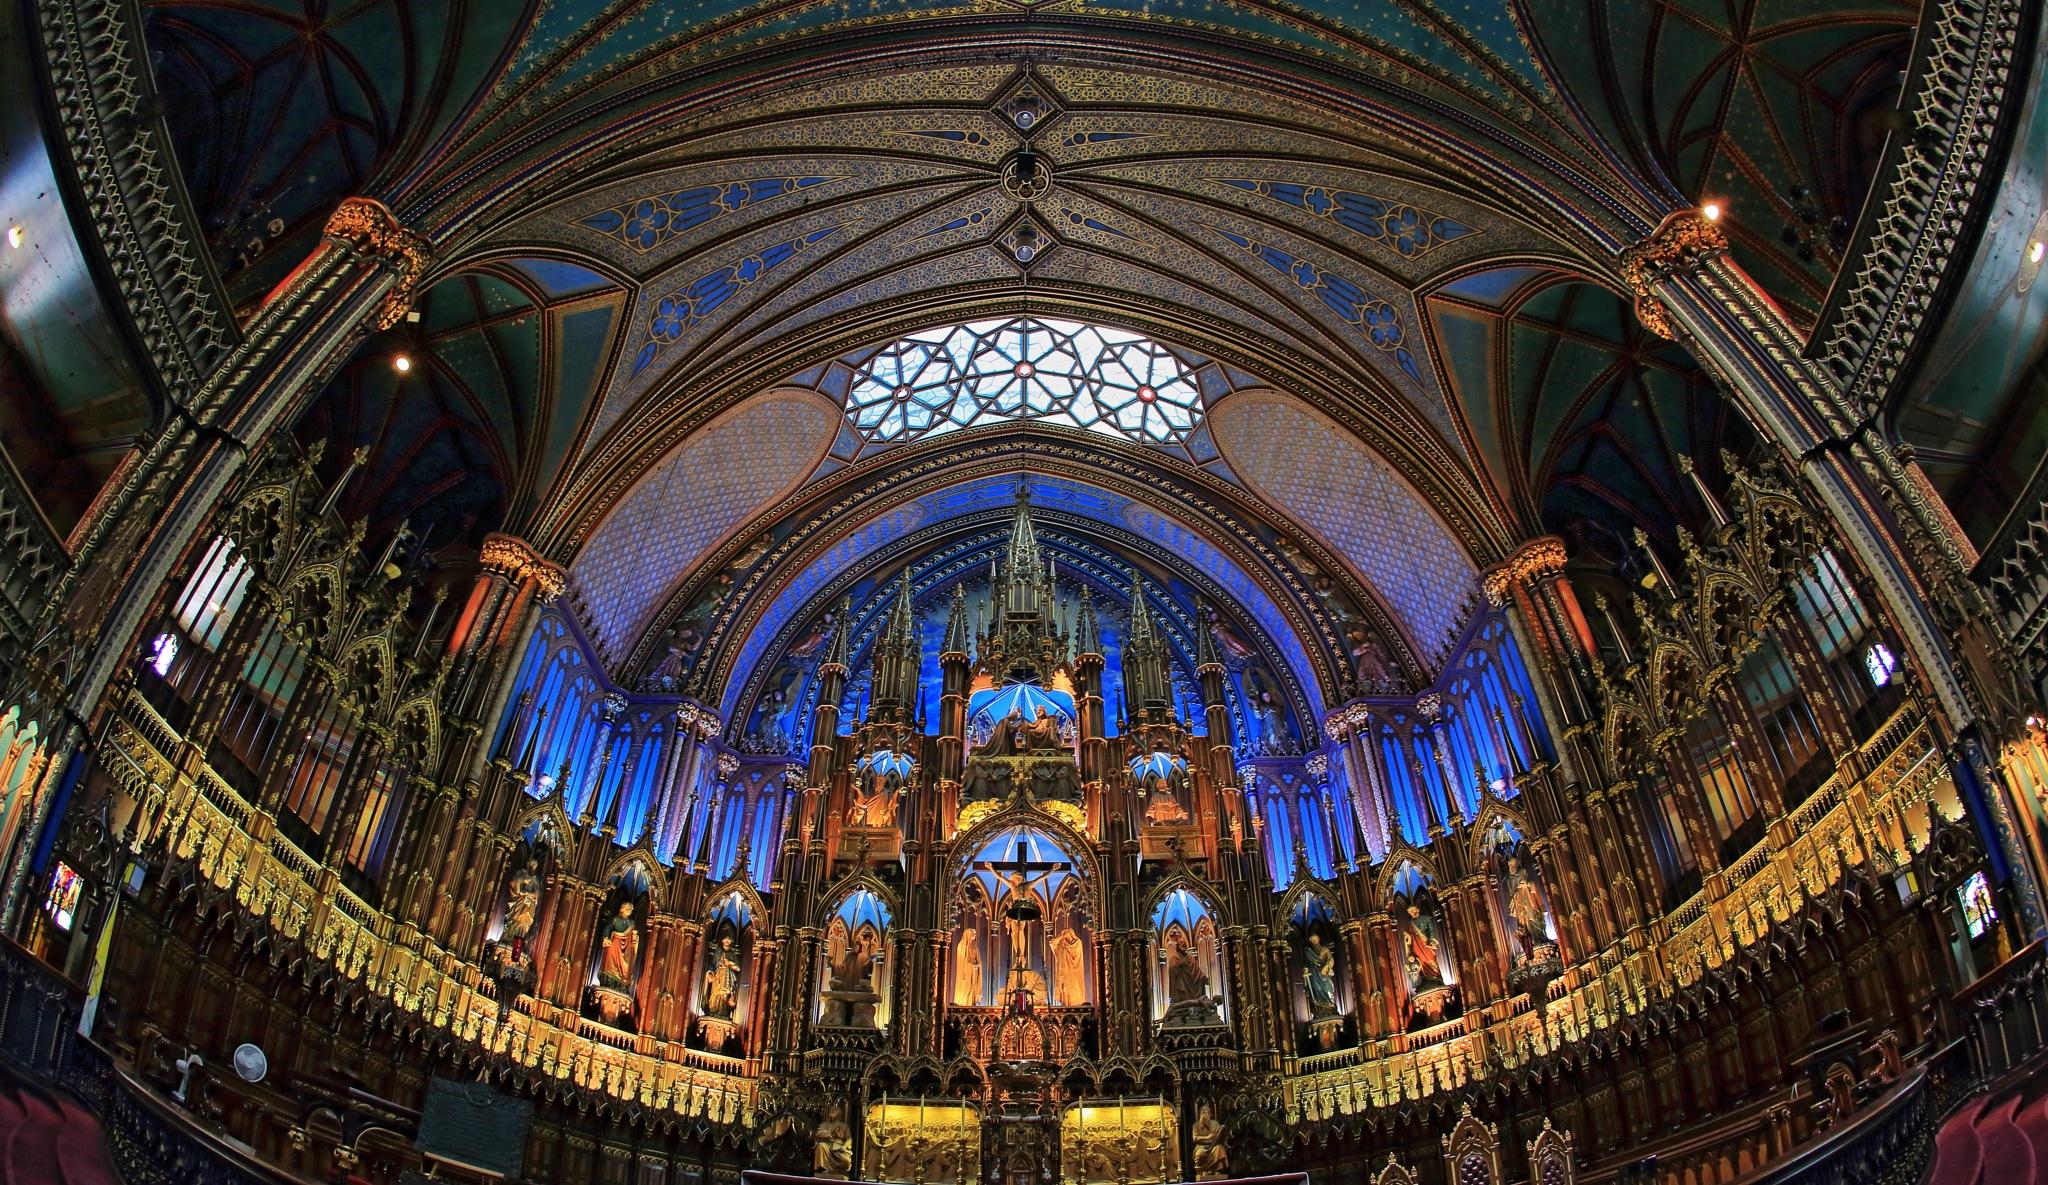 Notre-Dame Basilica (Montreal) by leecj0129